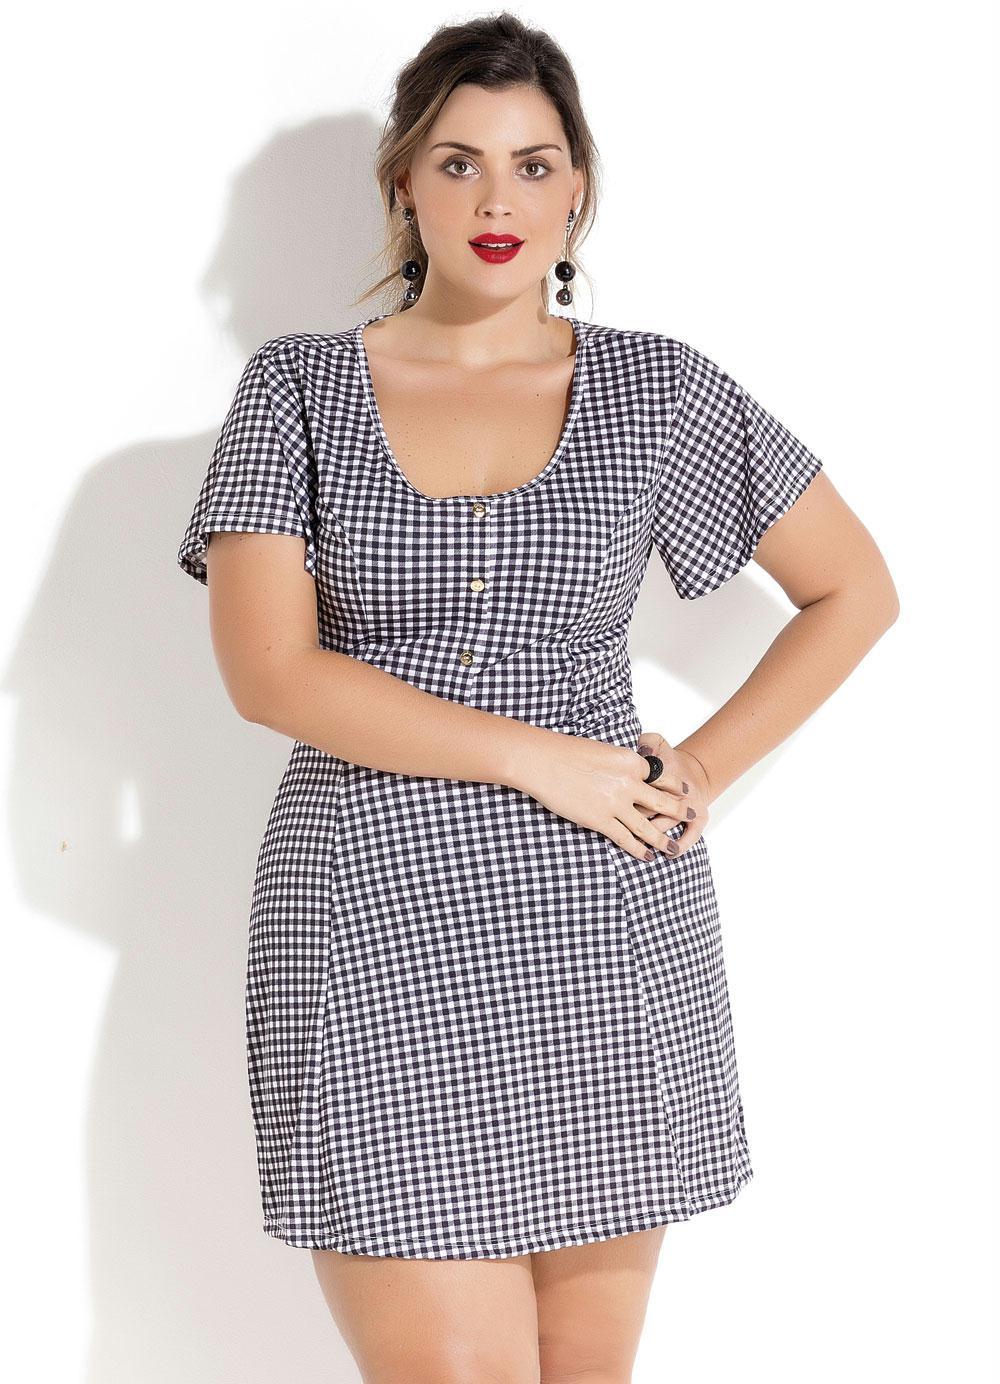 756be743b Vestido Evasê Xadrez Vichy Plus Size Quintess - Quintess